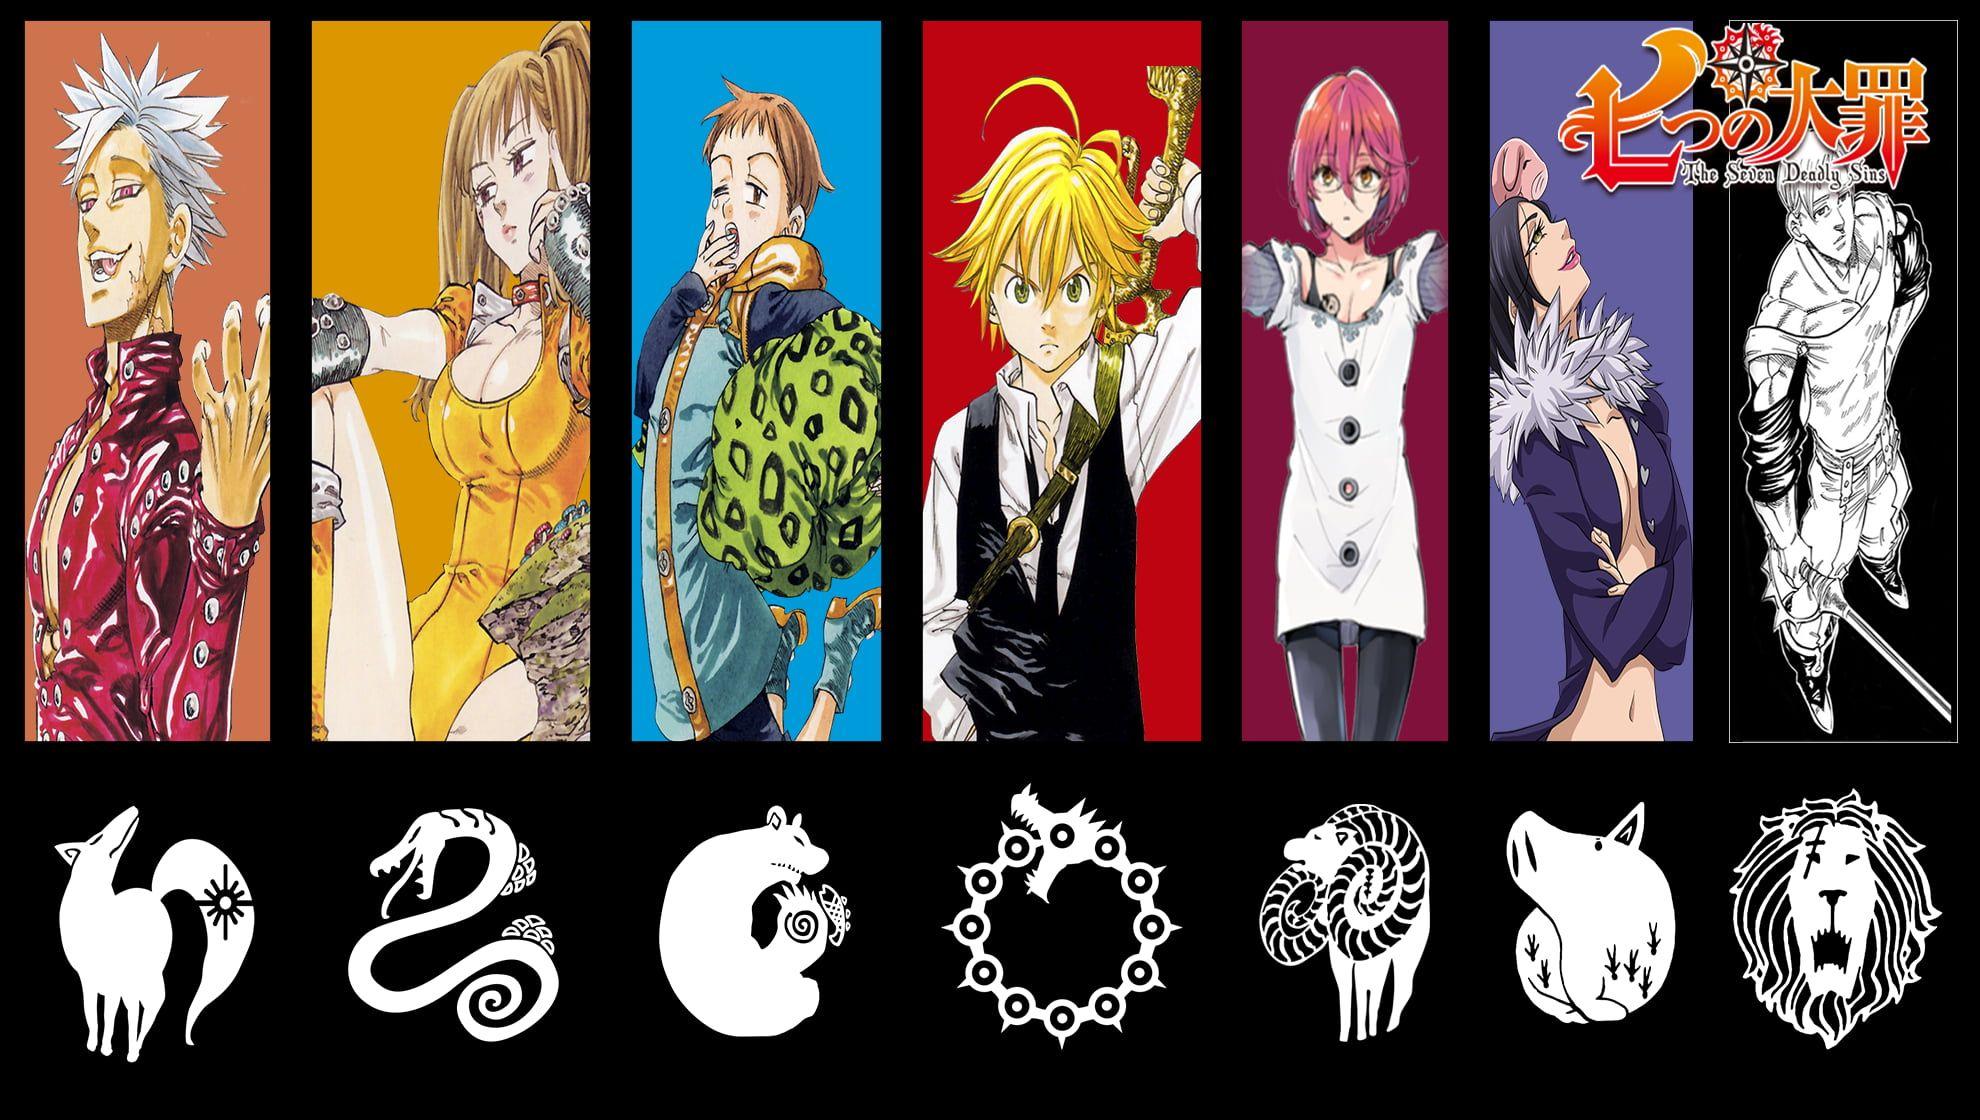 7 Deadly Sins Digital Wallpaper Anime Nanatsu No Taizai Manga Colorful Anime Boys Anime Gi Iphone Wallpaper Vintage Anime Wallpaper Iphone Seven Deadly Sins